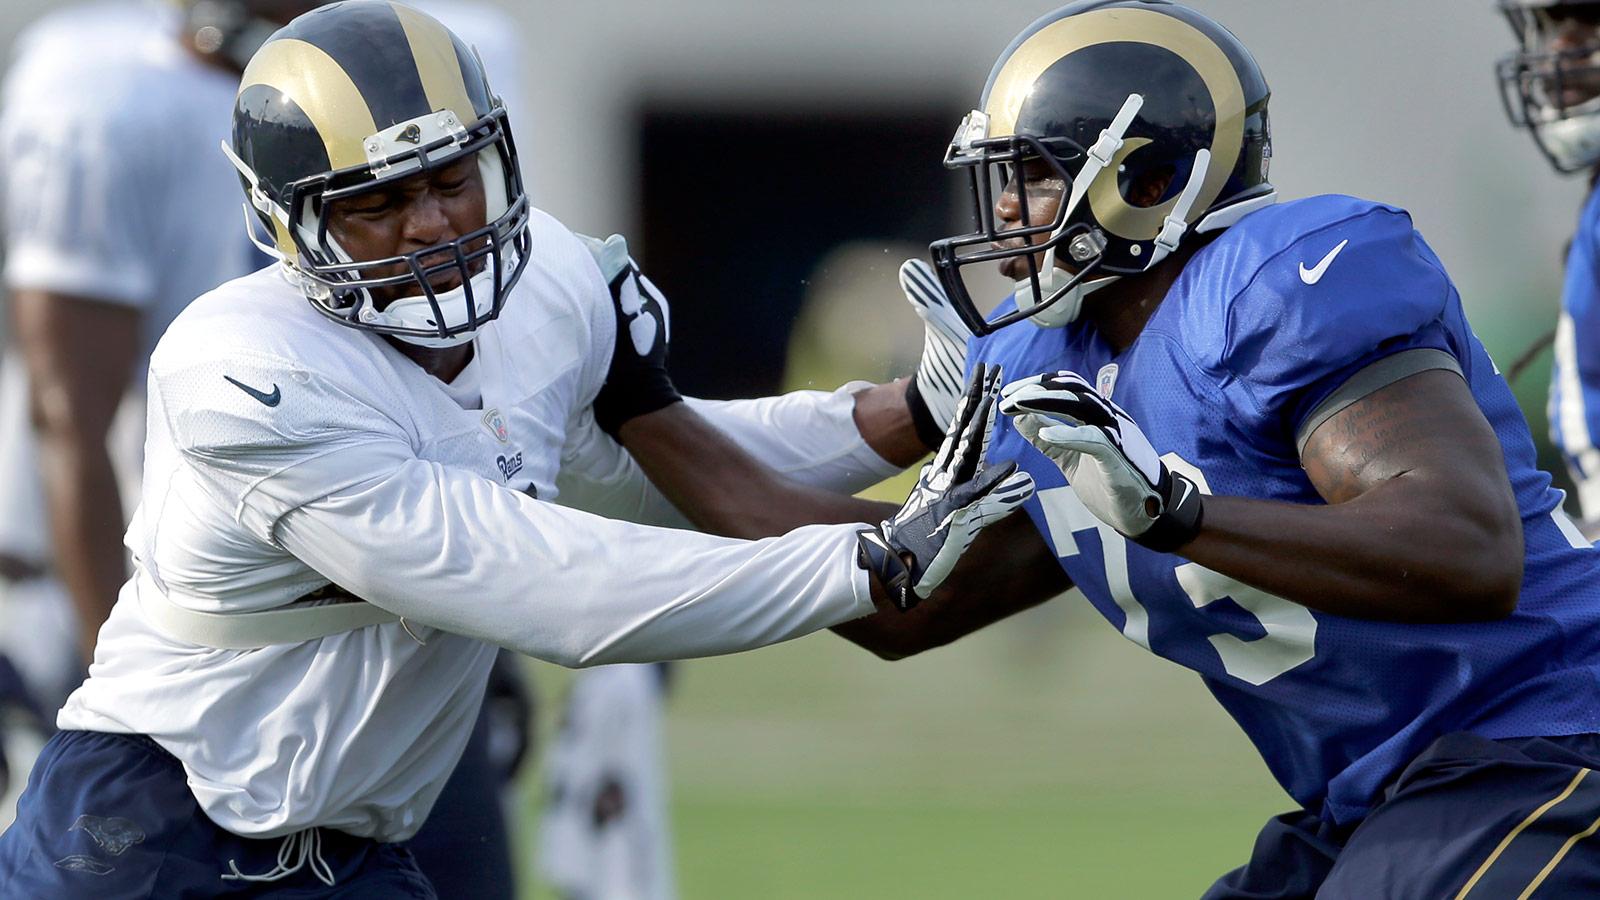 In second season, Rams OT Greg Robinson is an experienced hand